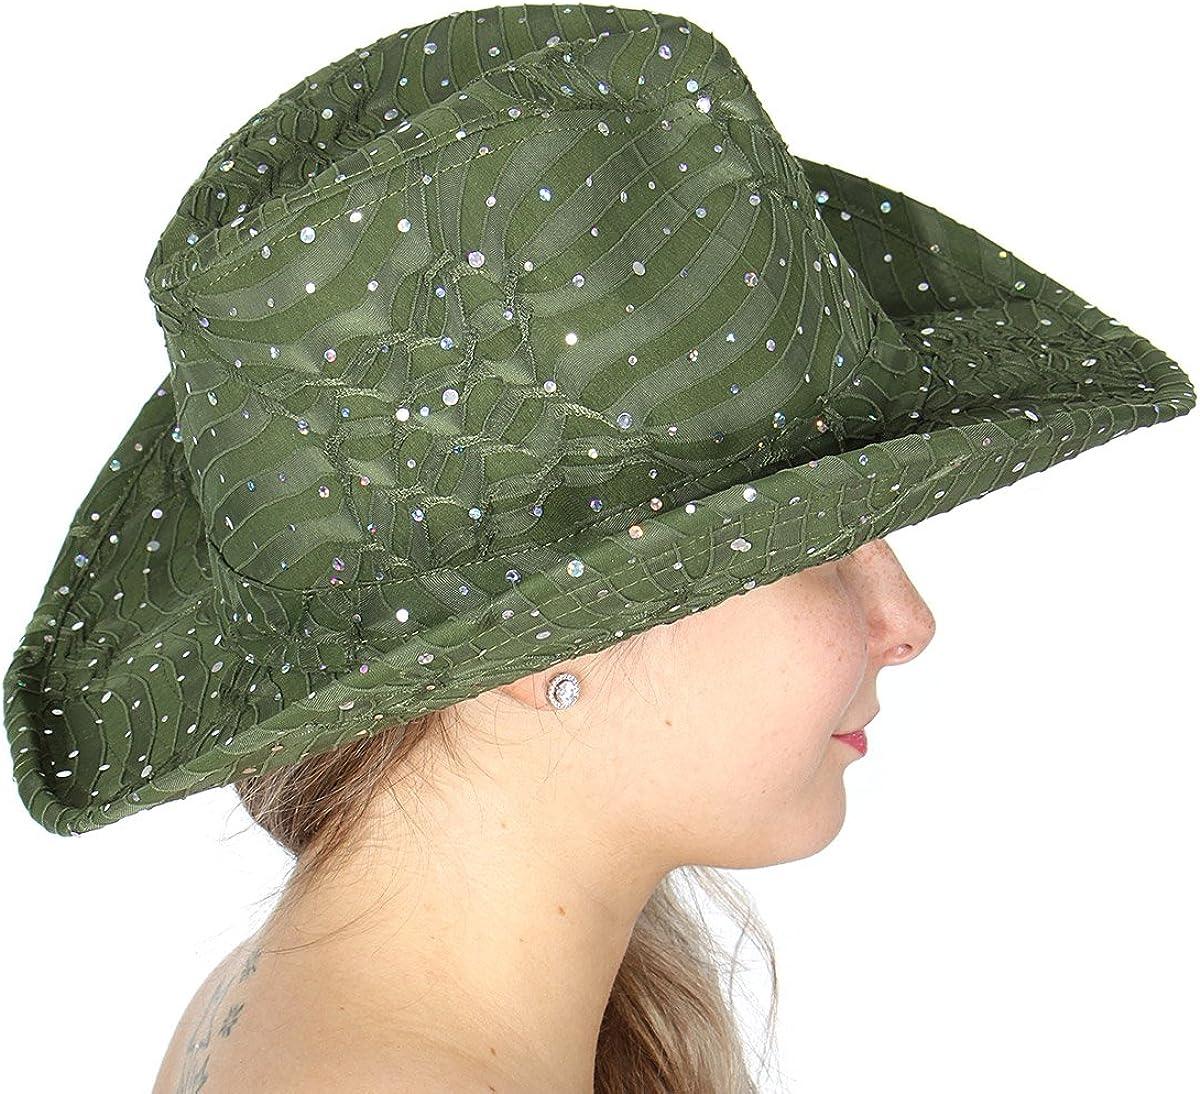 SERENITA Cowboy Hats for Women 1920s Panama Jazz Visor Gang Cowgirl hat Wide Brim Fedora Hat